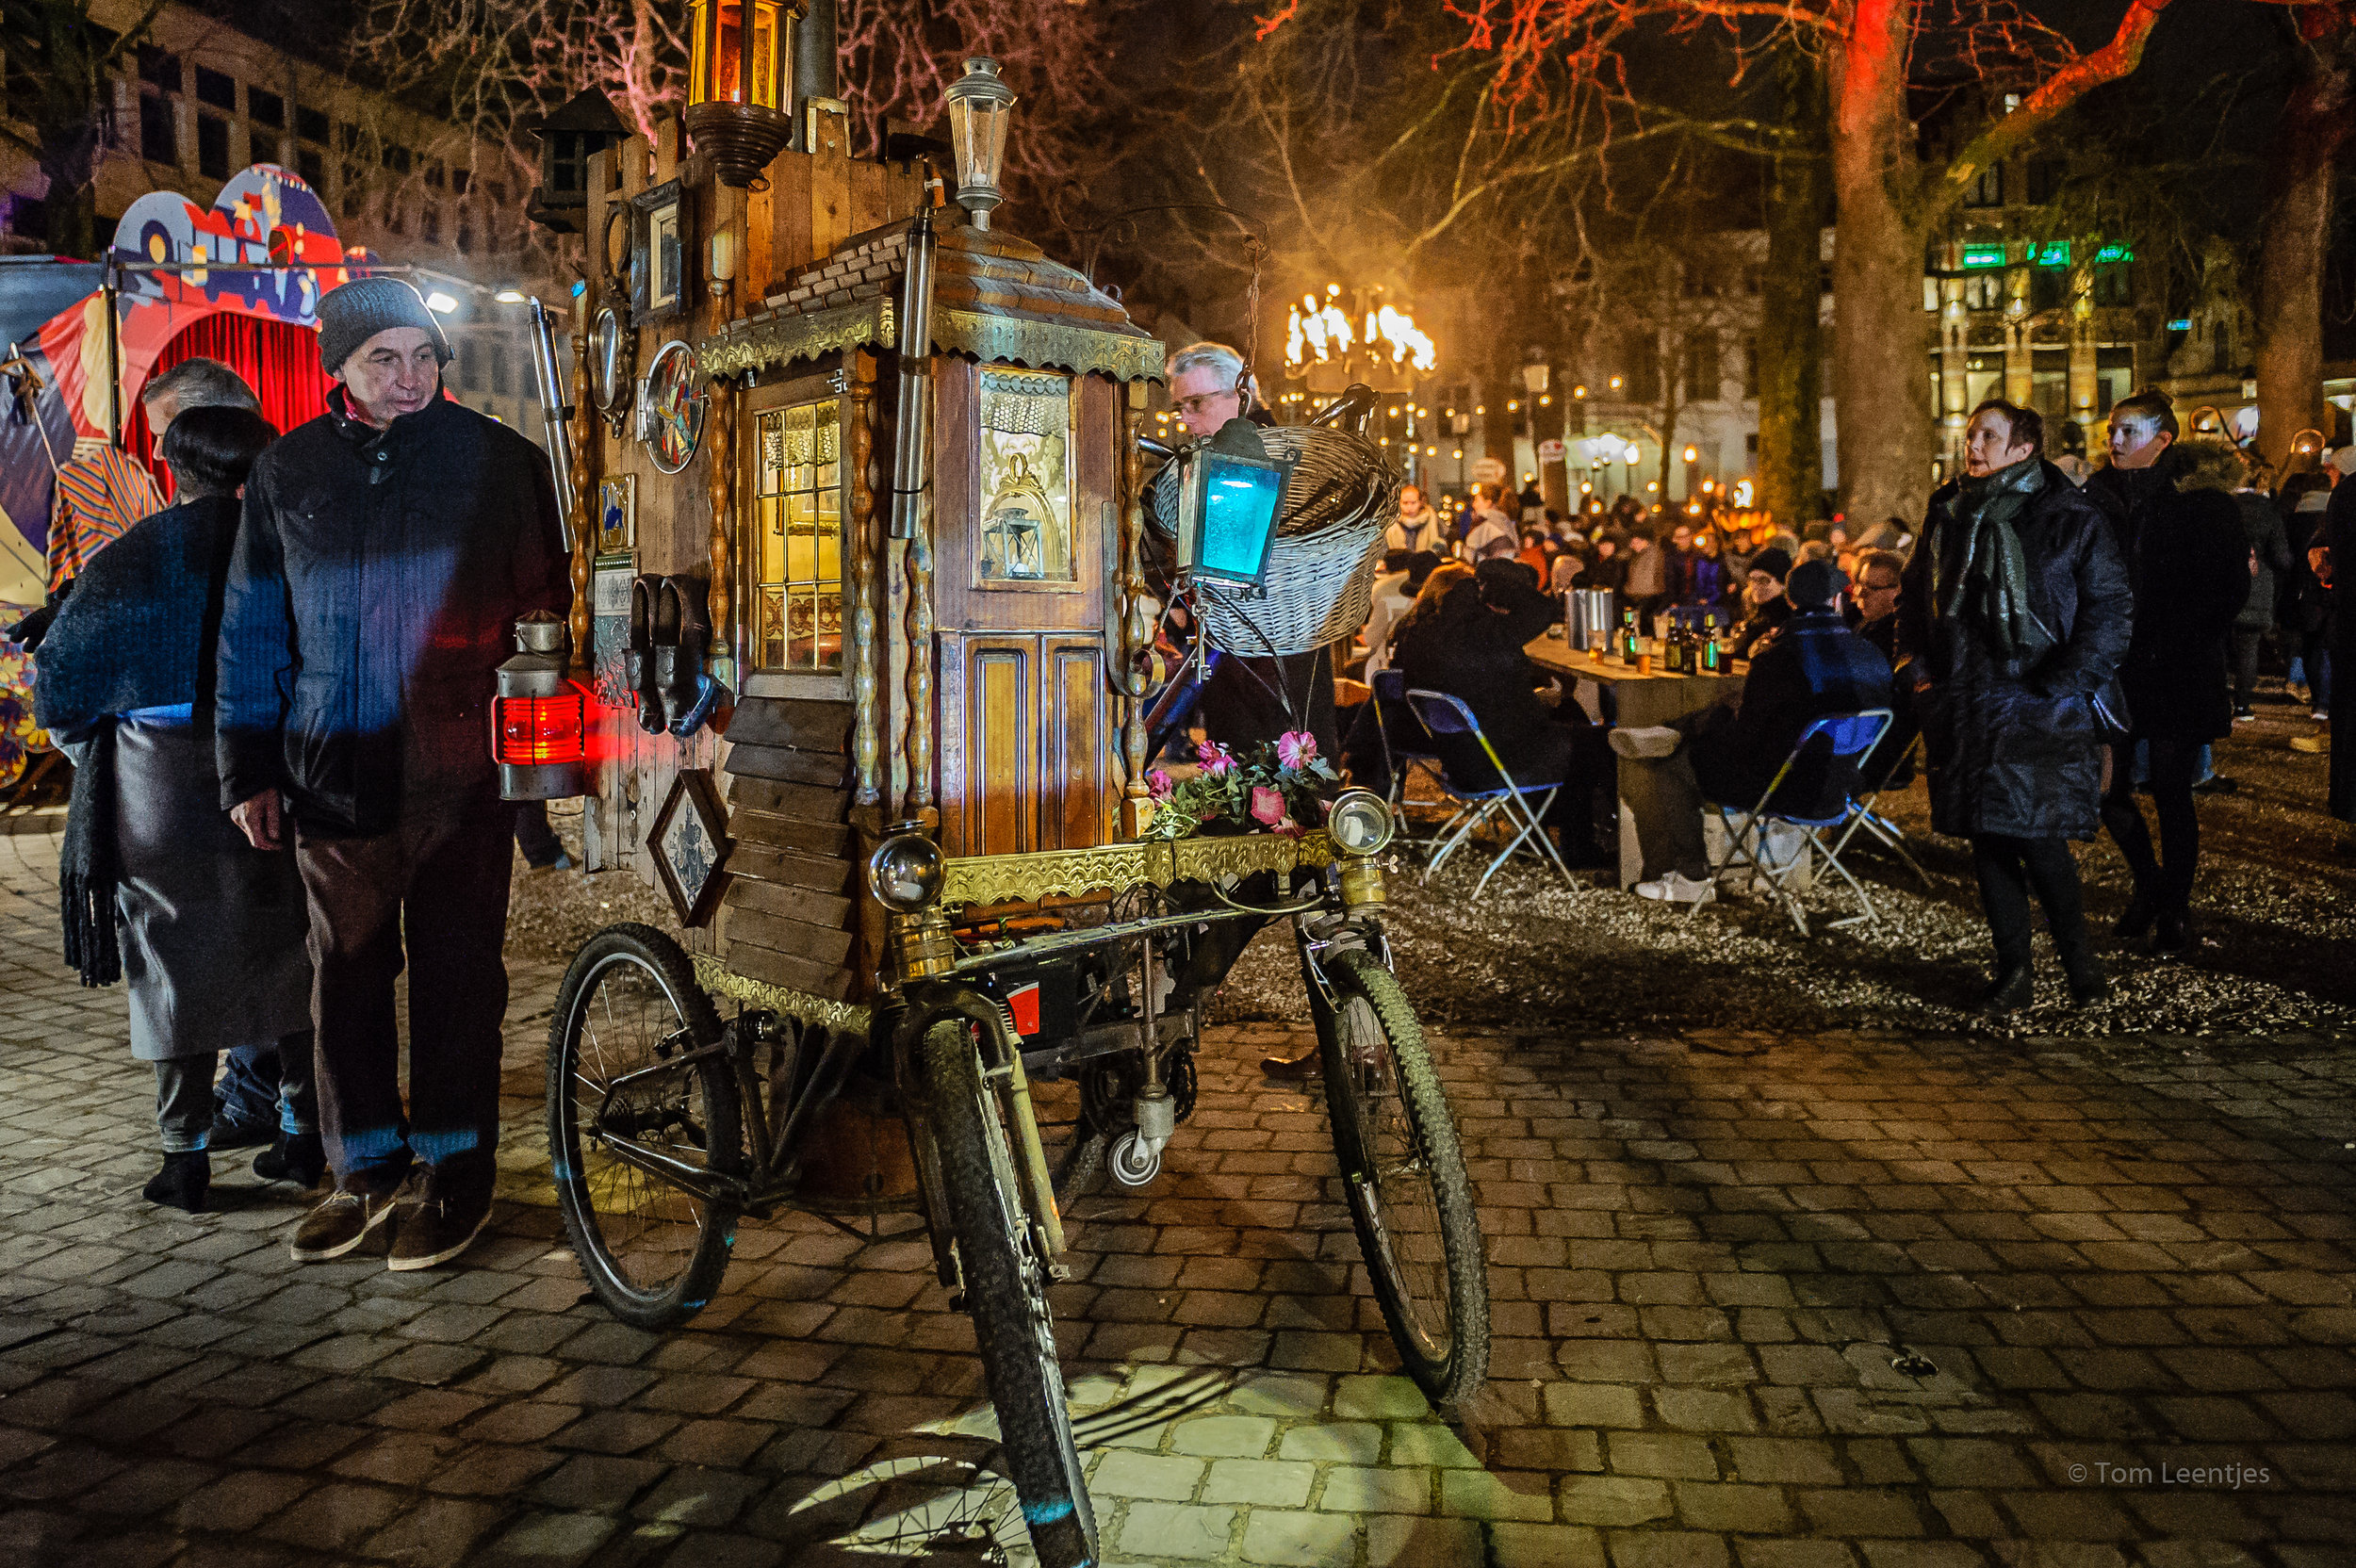 20180126_Wintervonken_Burg_Brugge_Tom_Leentjes-8.jpg